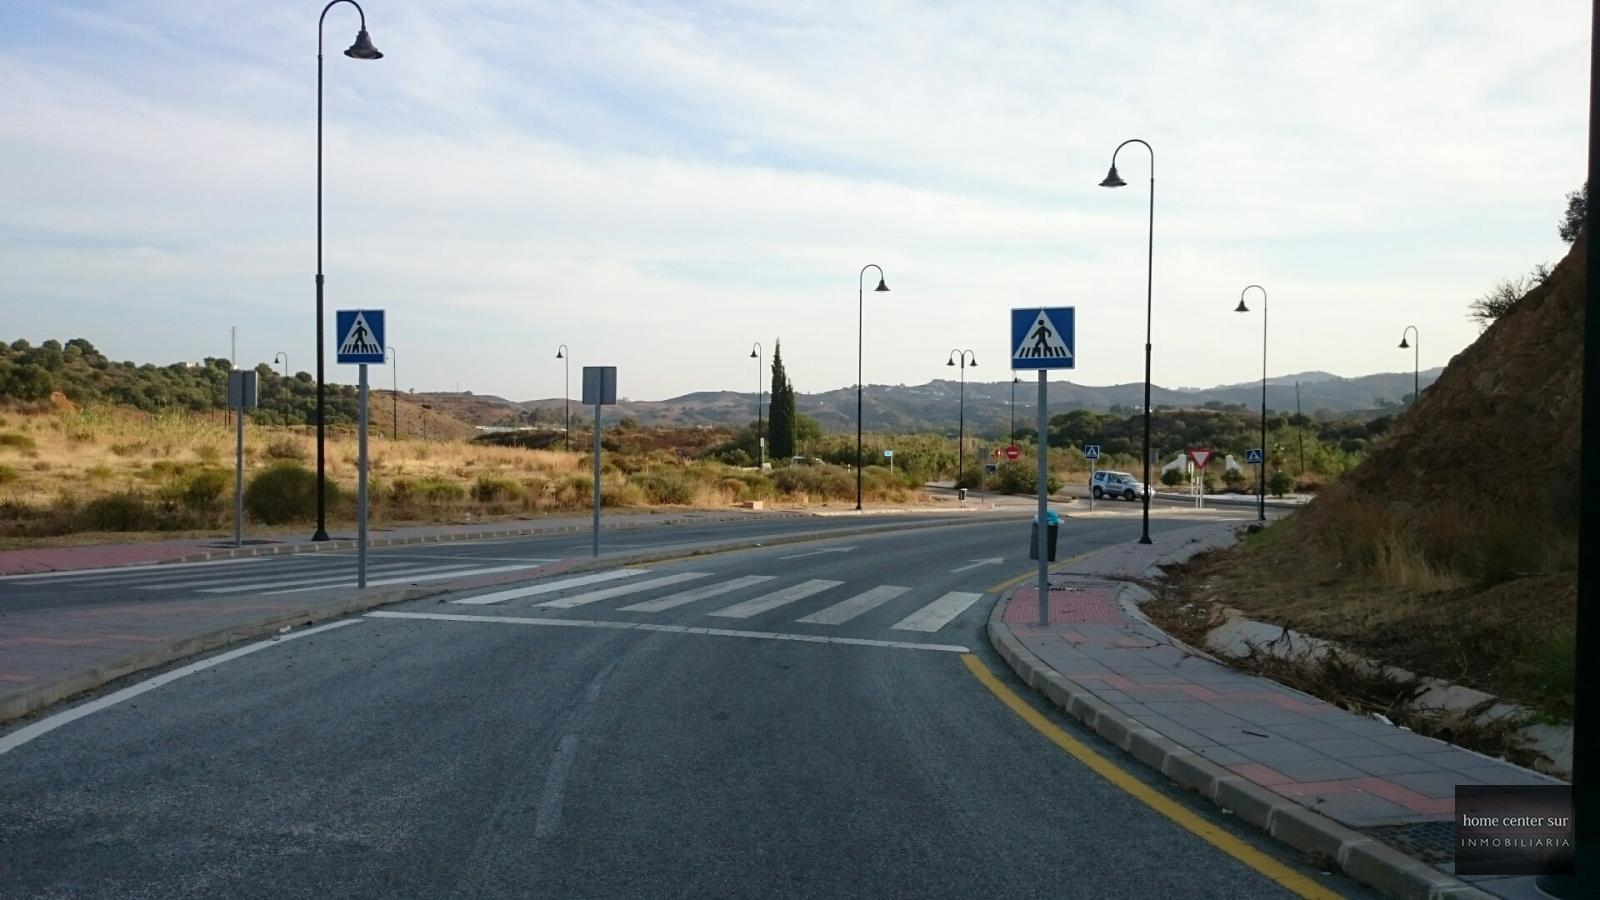 Terrain en vente à undefined unde (Mijas Costa), 149.000 €